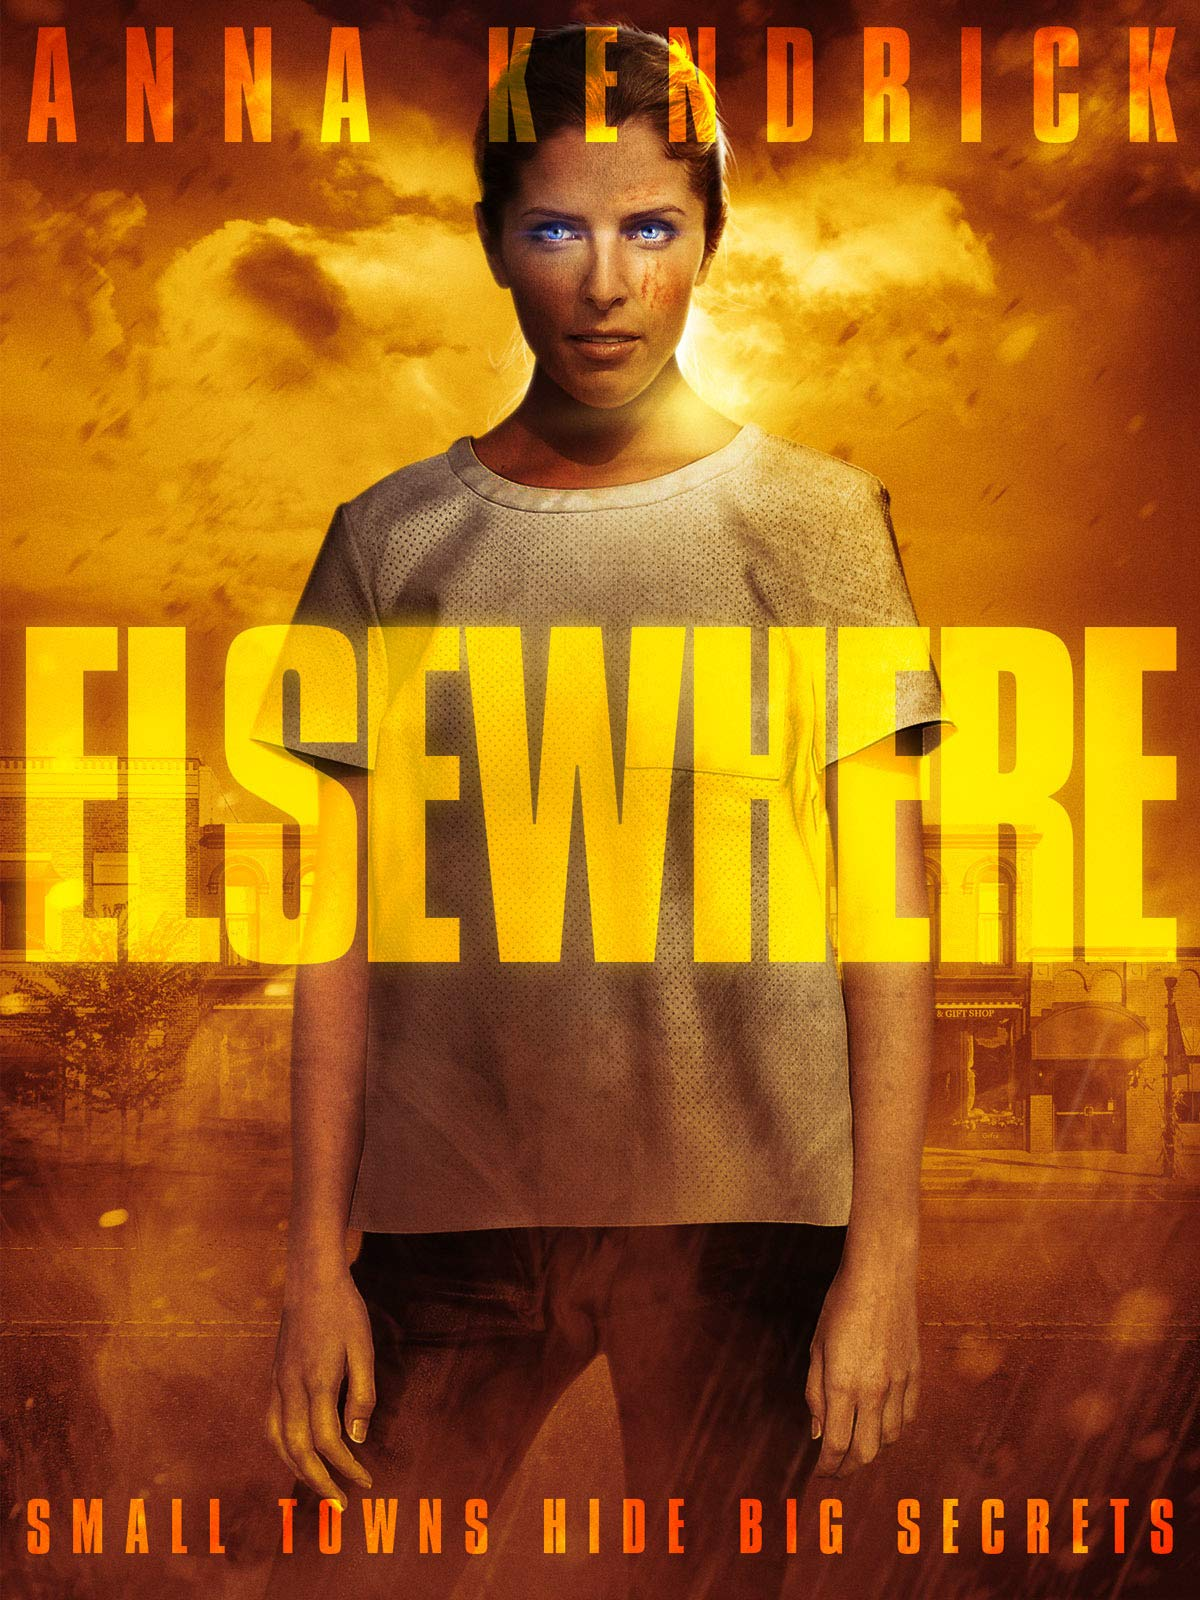 Elsewhere on Amazon Prime Video UK